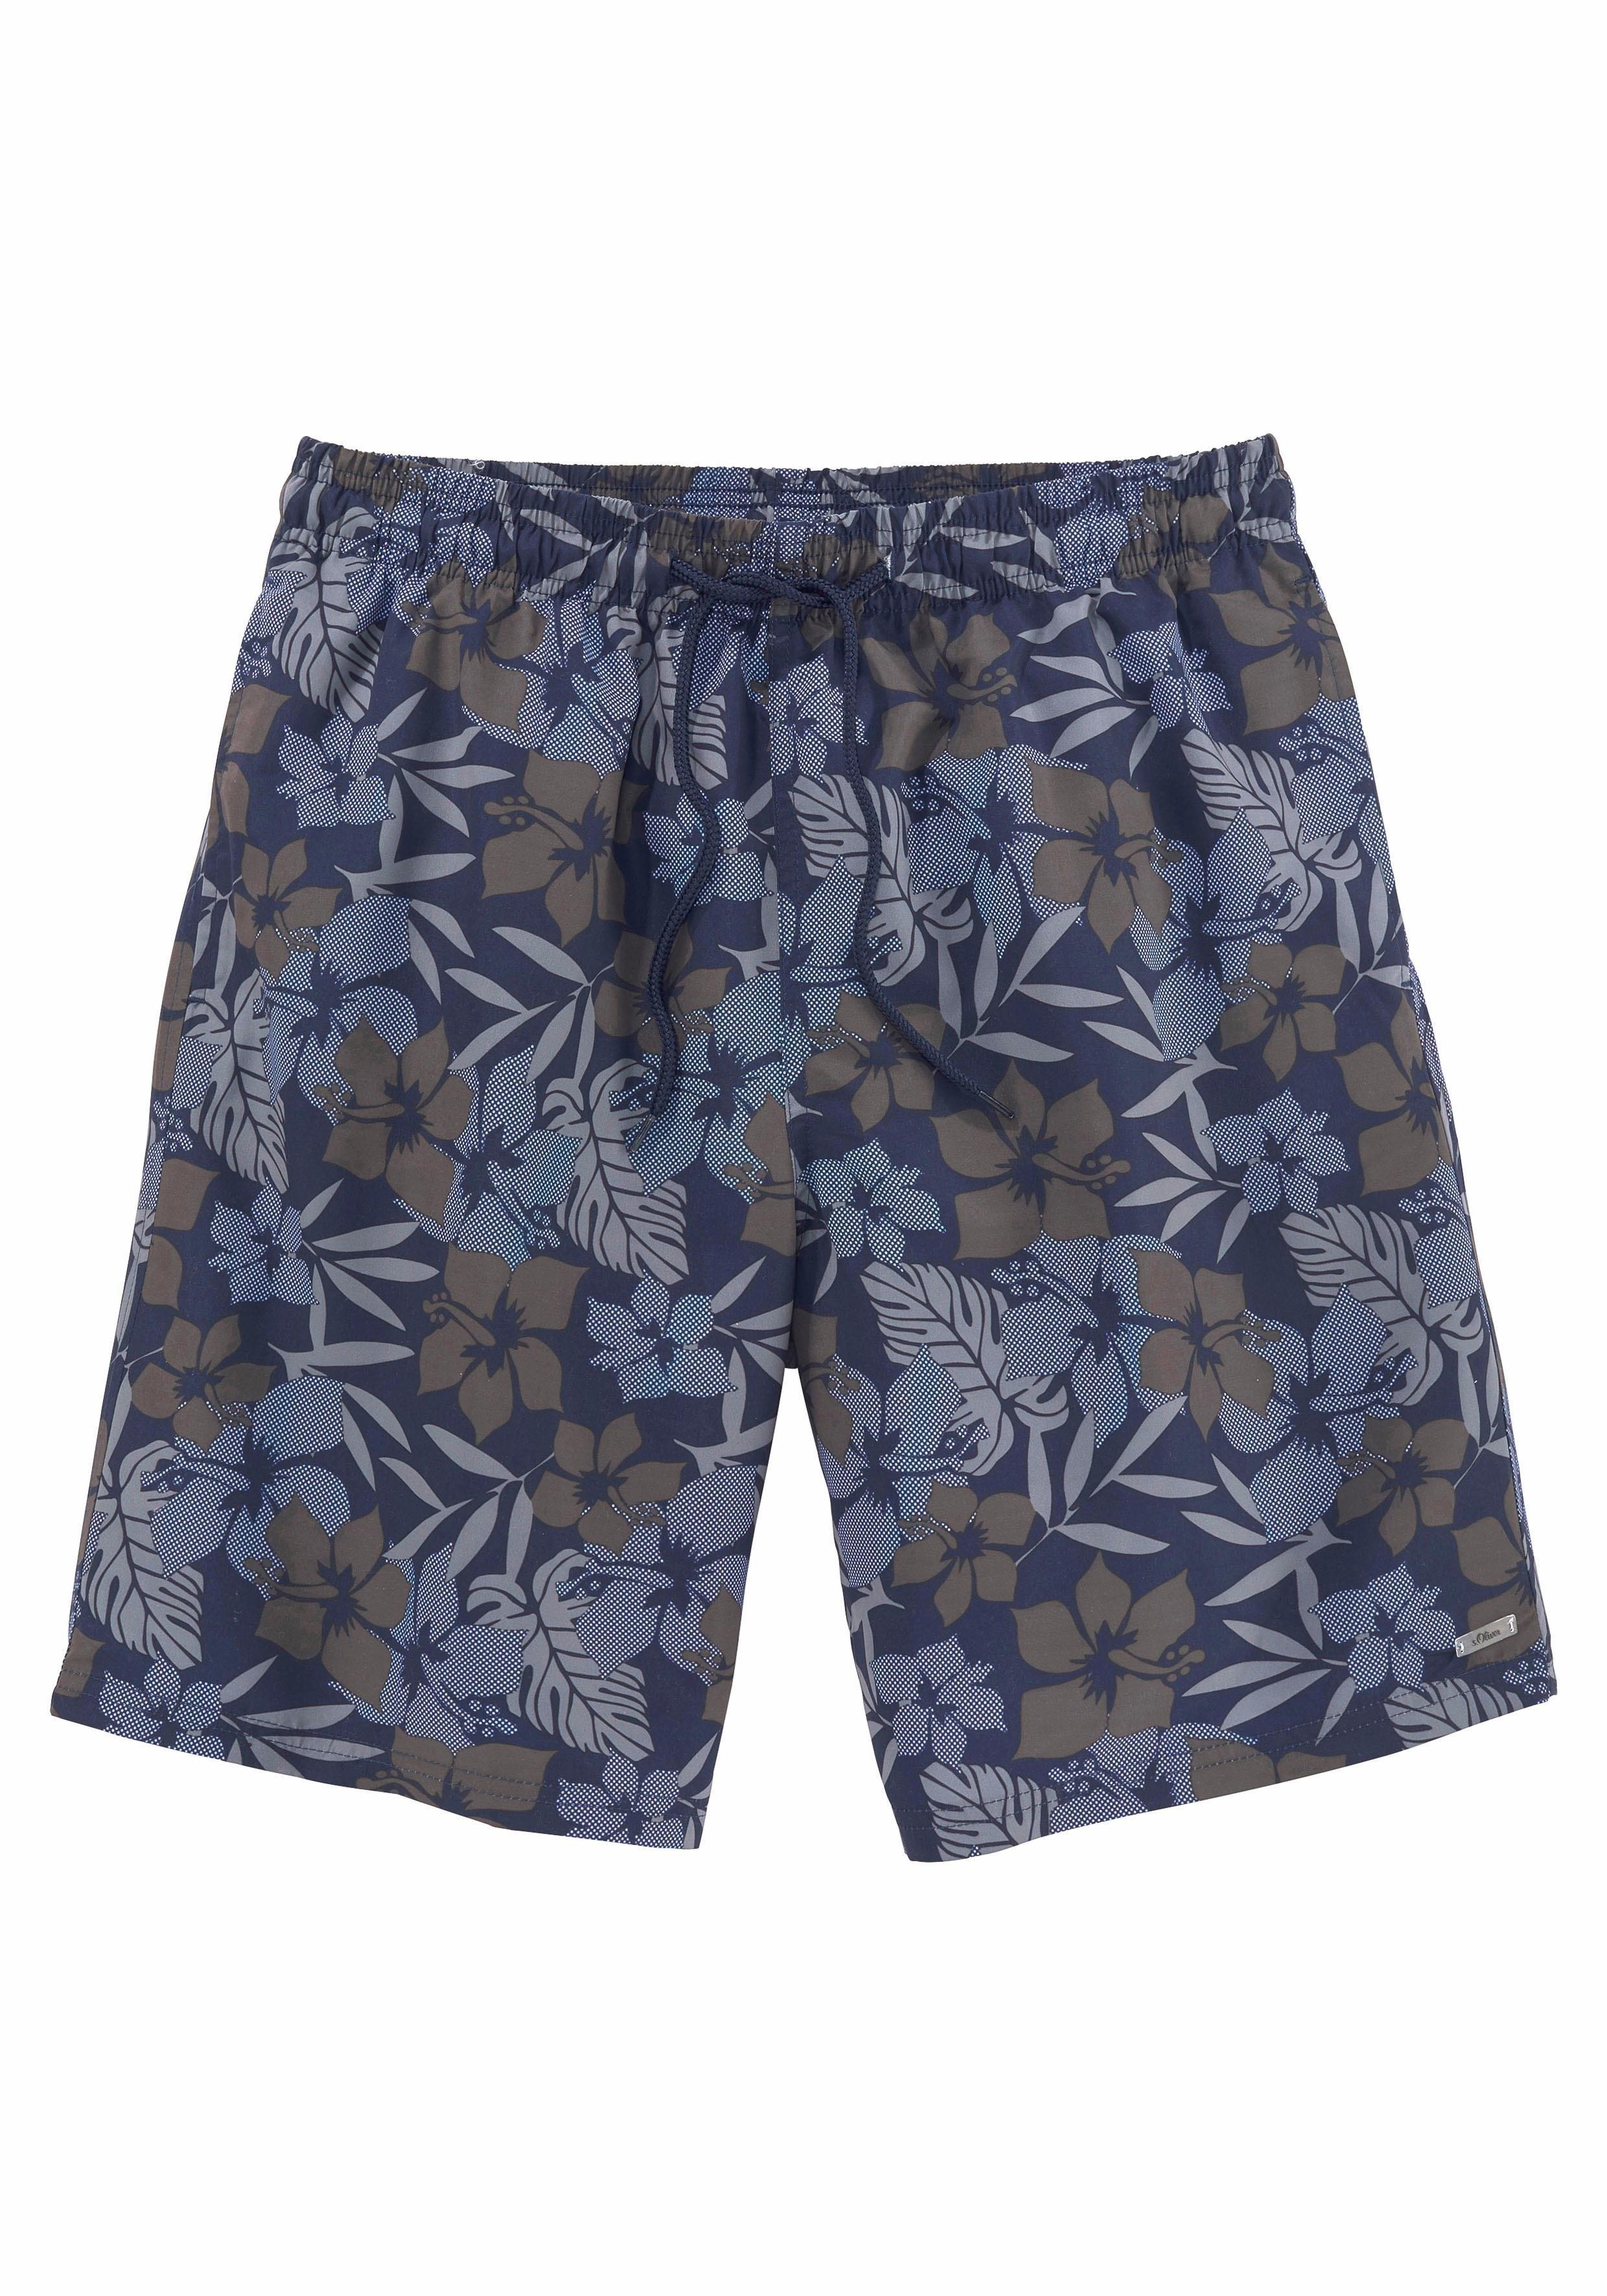 s.Oliver Beachwear s.Oliver RED LABEL Beachwear zwemshort nu online kopen bij Lascana